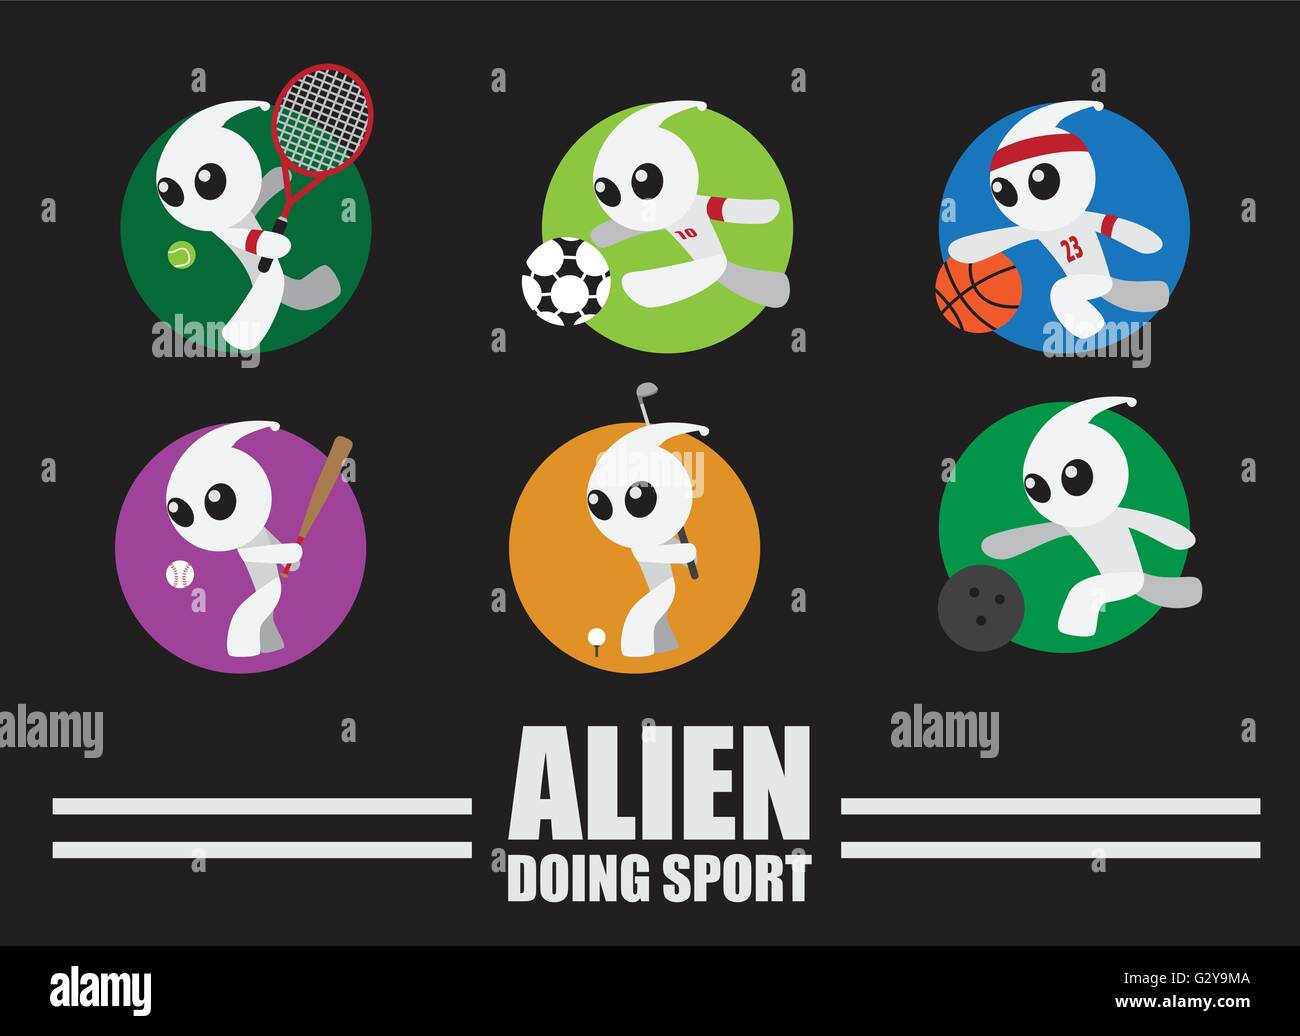 Alien doing sport - Stock Vector